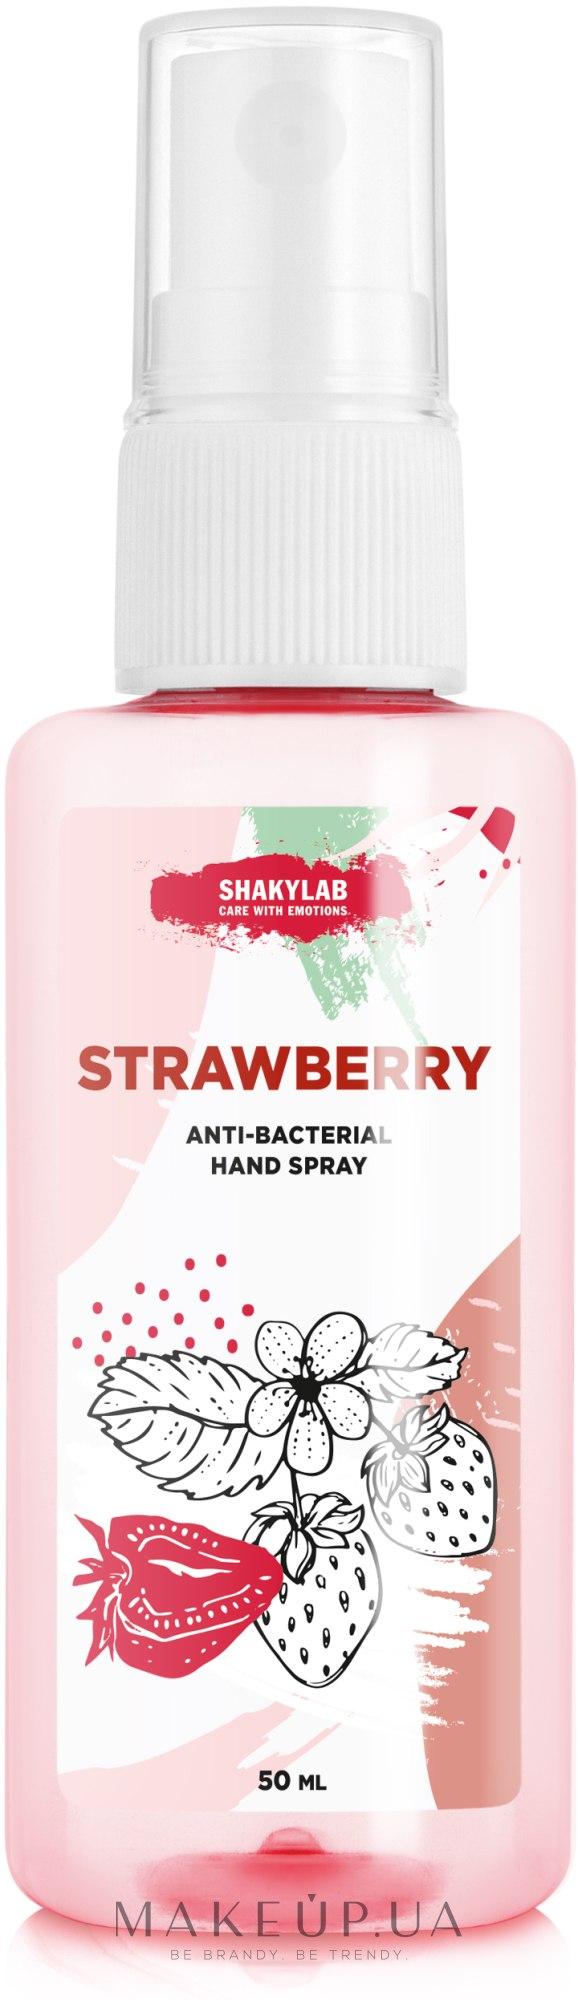 "Антибактериальный спрей для рук ""Strawberry"" - SHAKYLAB Anti-Bacterial Hand Spray — фото 50ml"